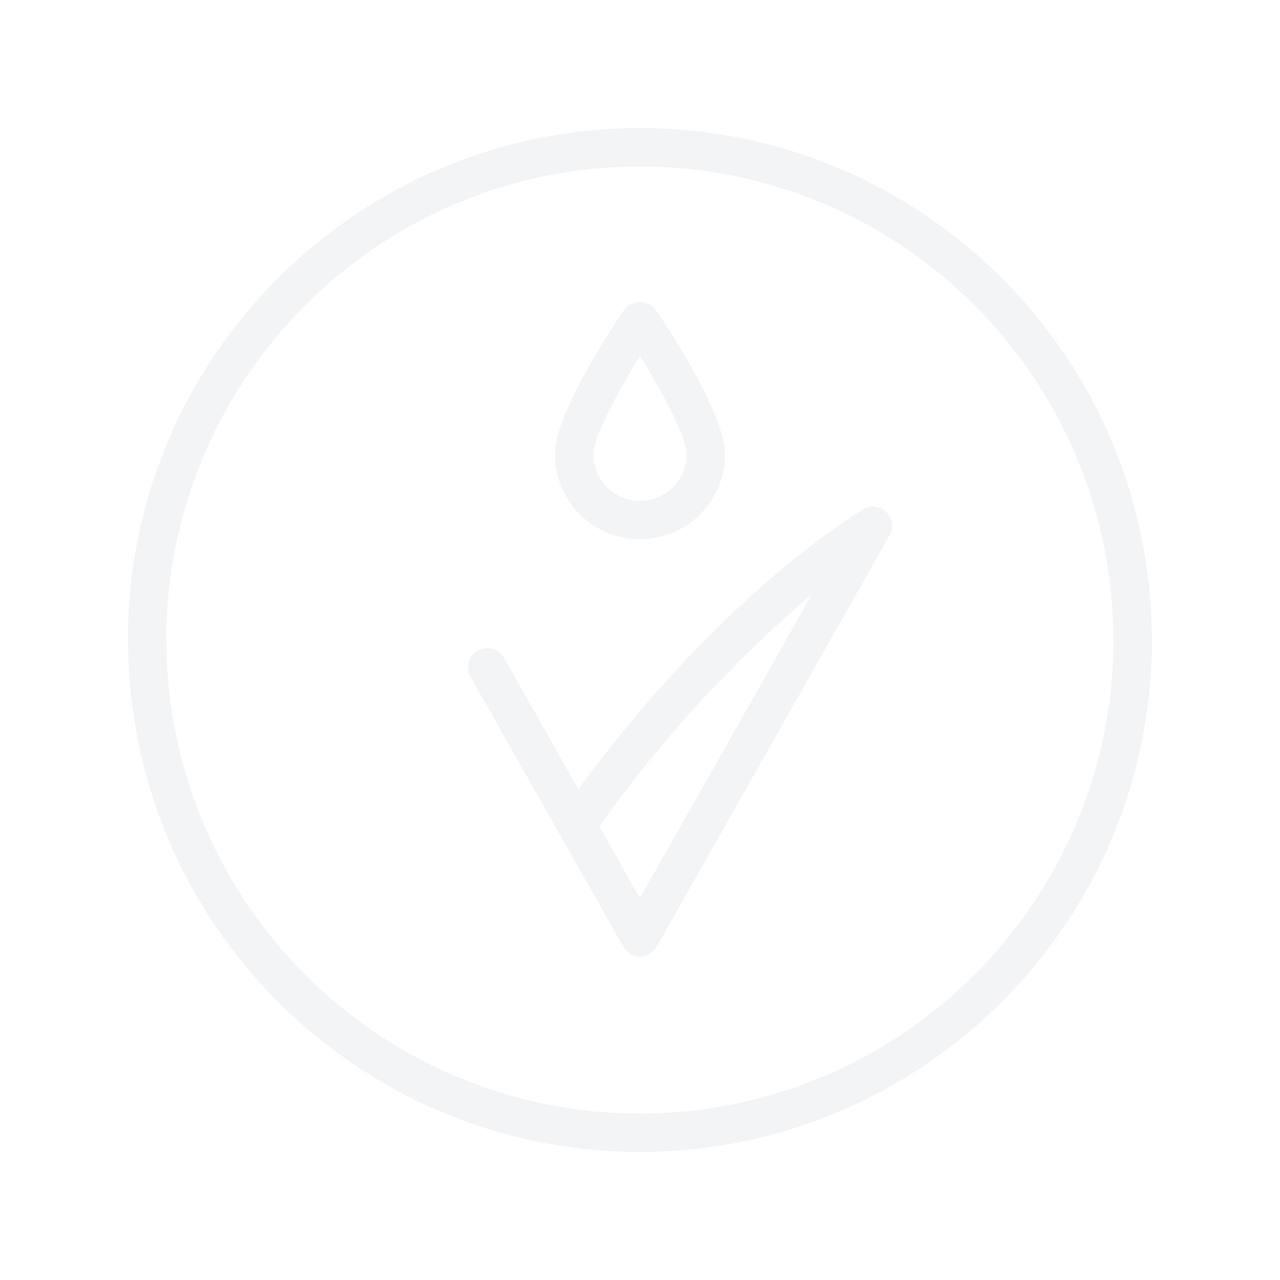 Moschino Cheap & Chic I Love Love 50ml Eau De Toilette Gift Set